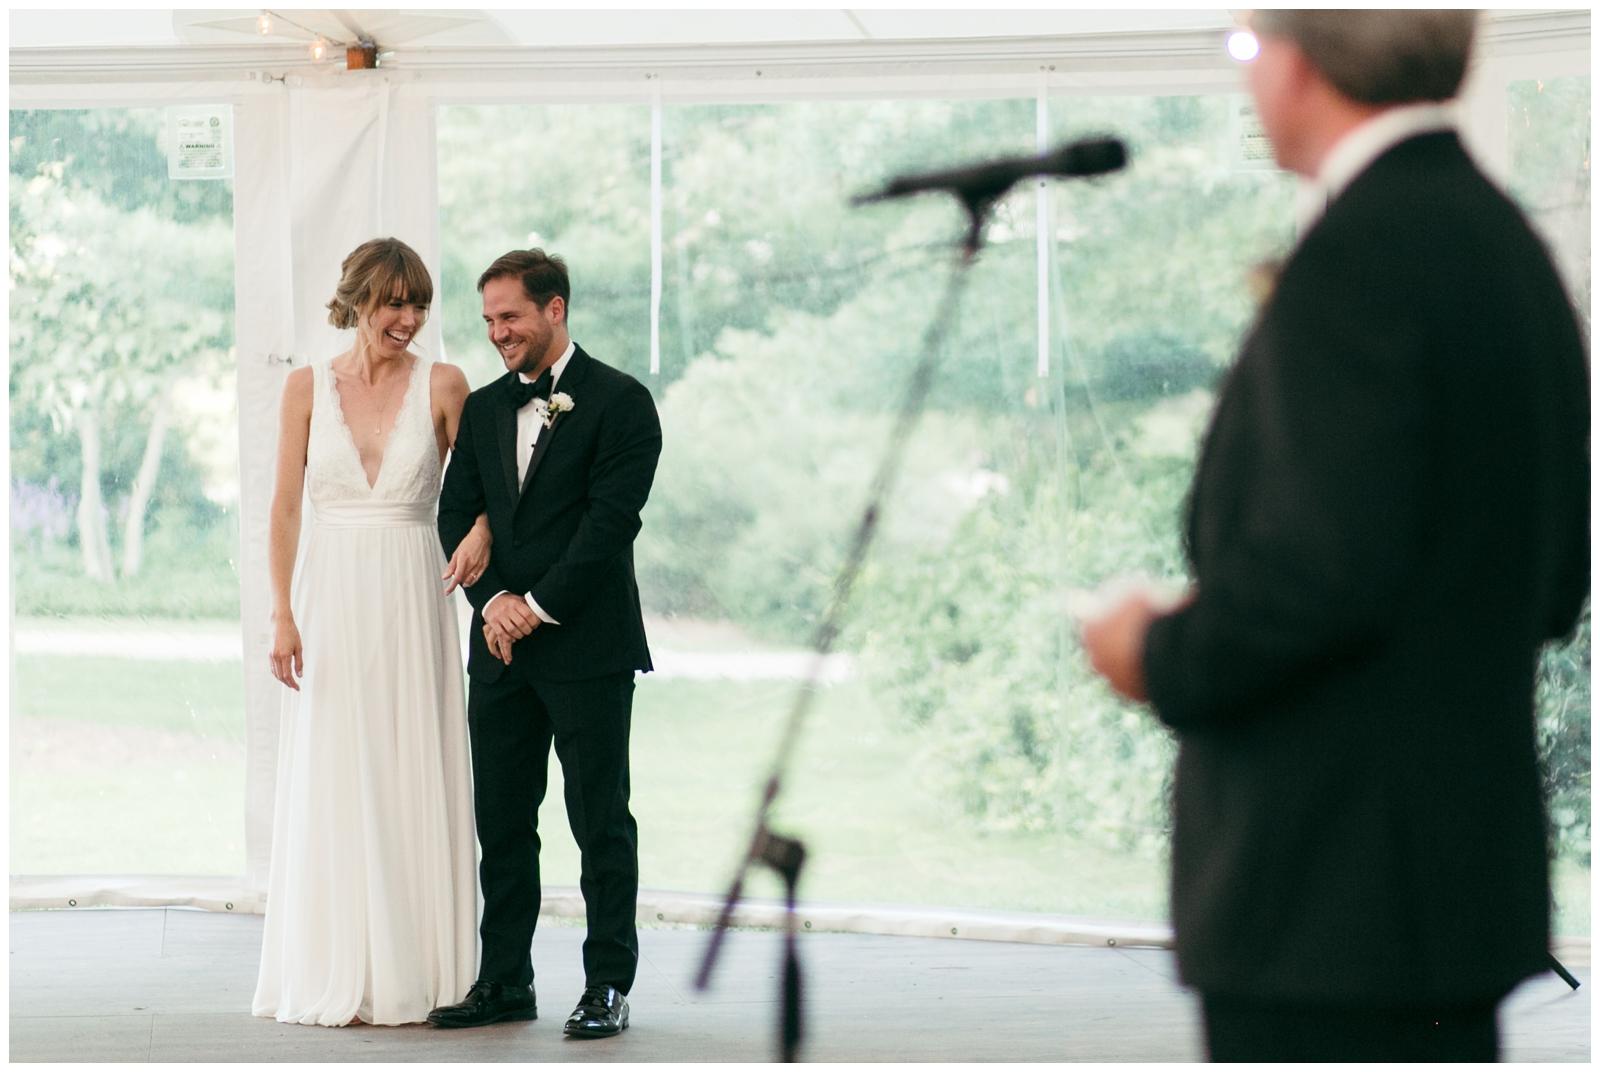 Moraine-Farm-wedding-Bailey-Q-Photo-Massachusetts-wedding-photpgrapher-124.jpg